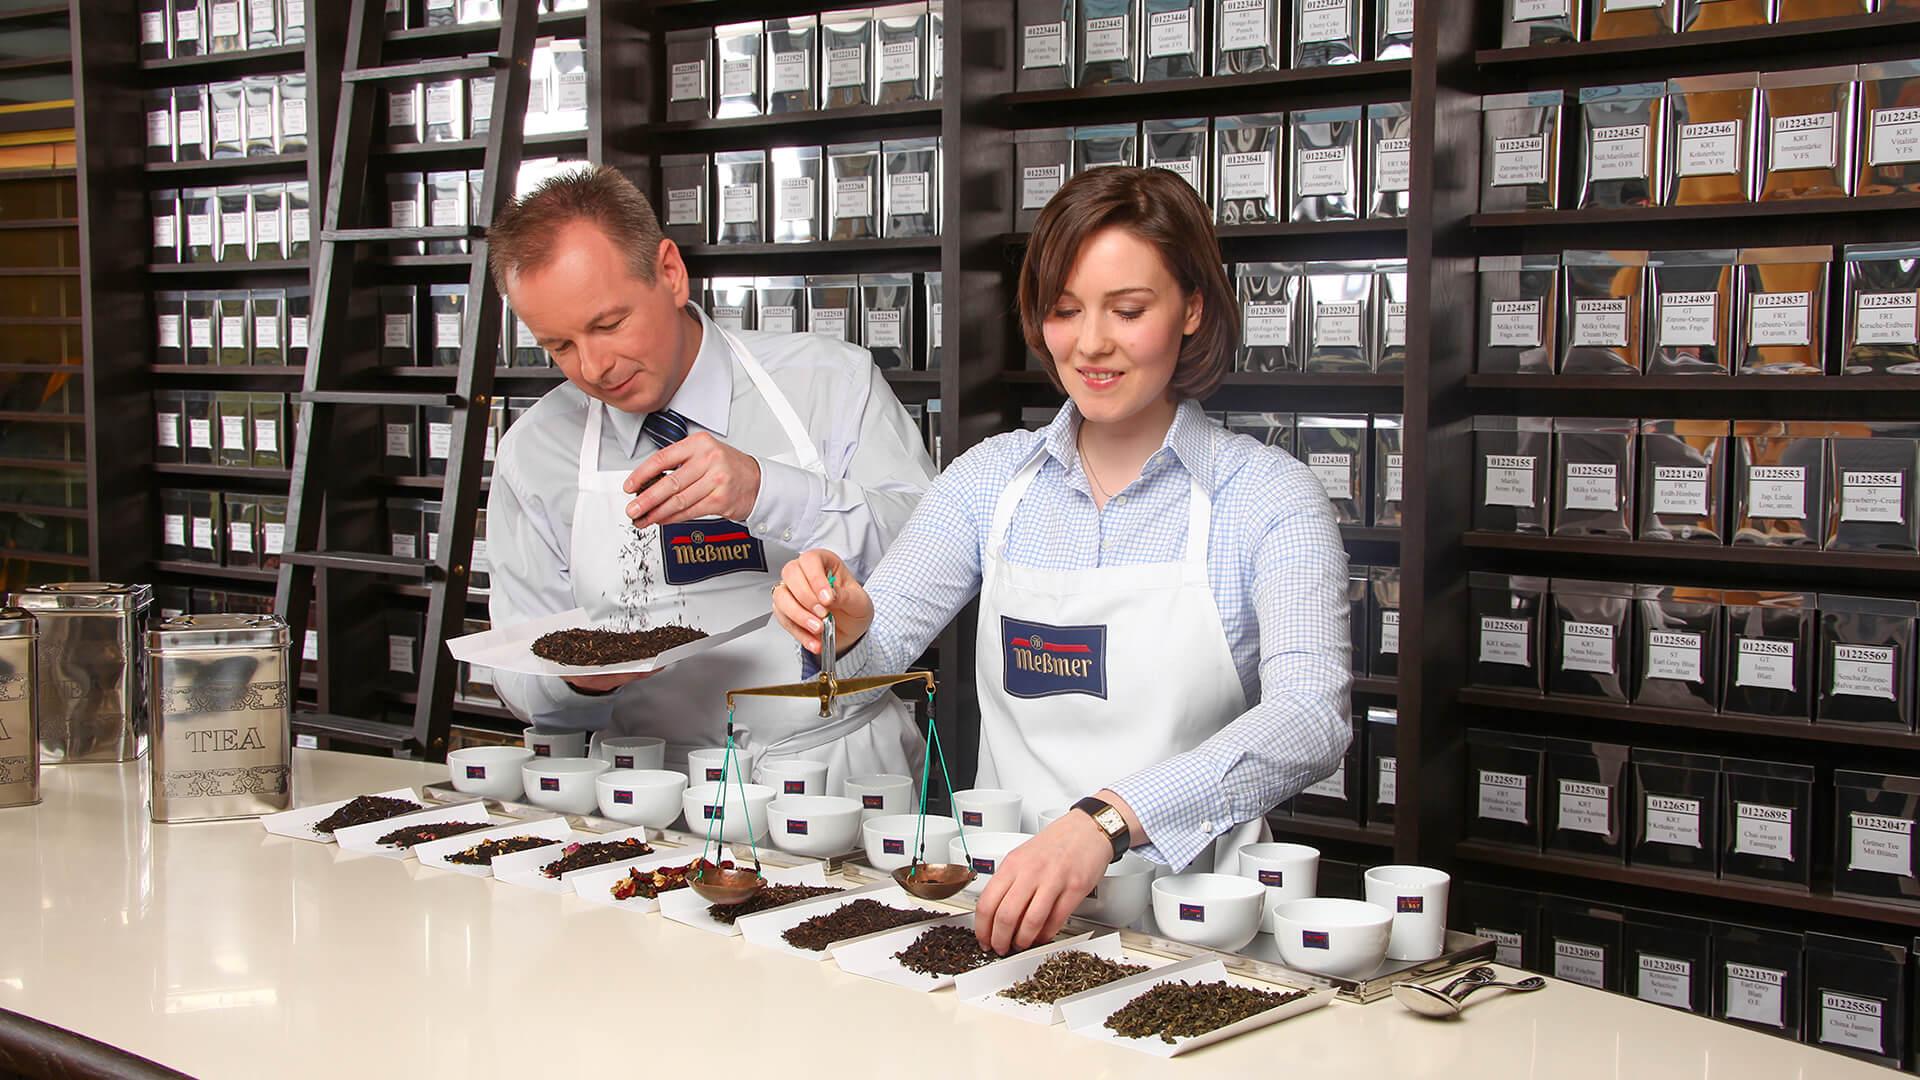 Man and woman working on tea testing